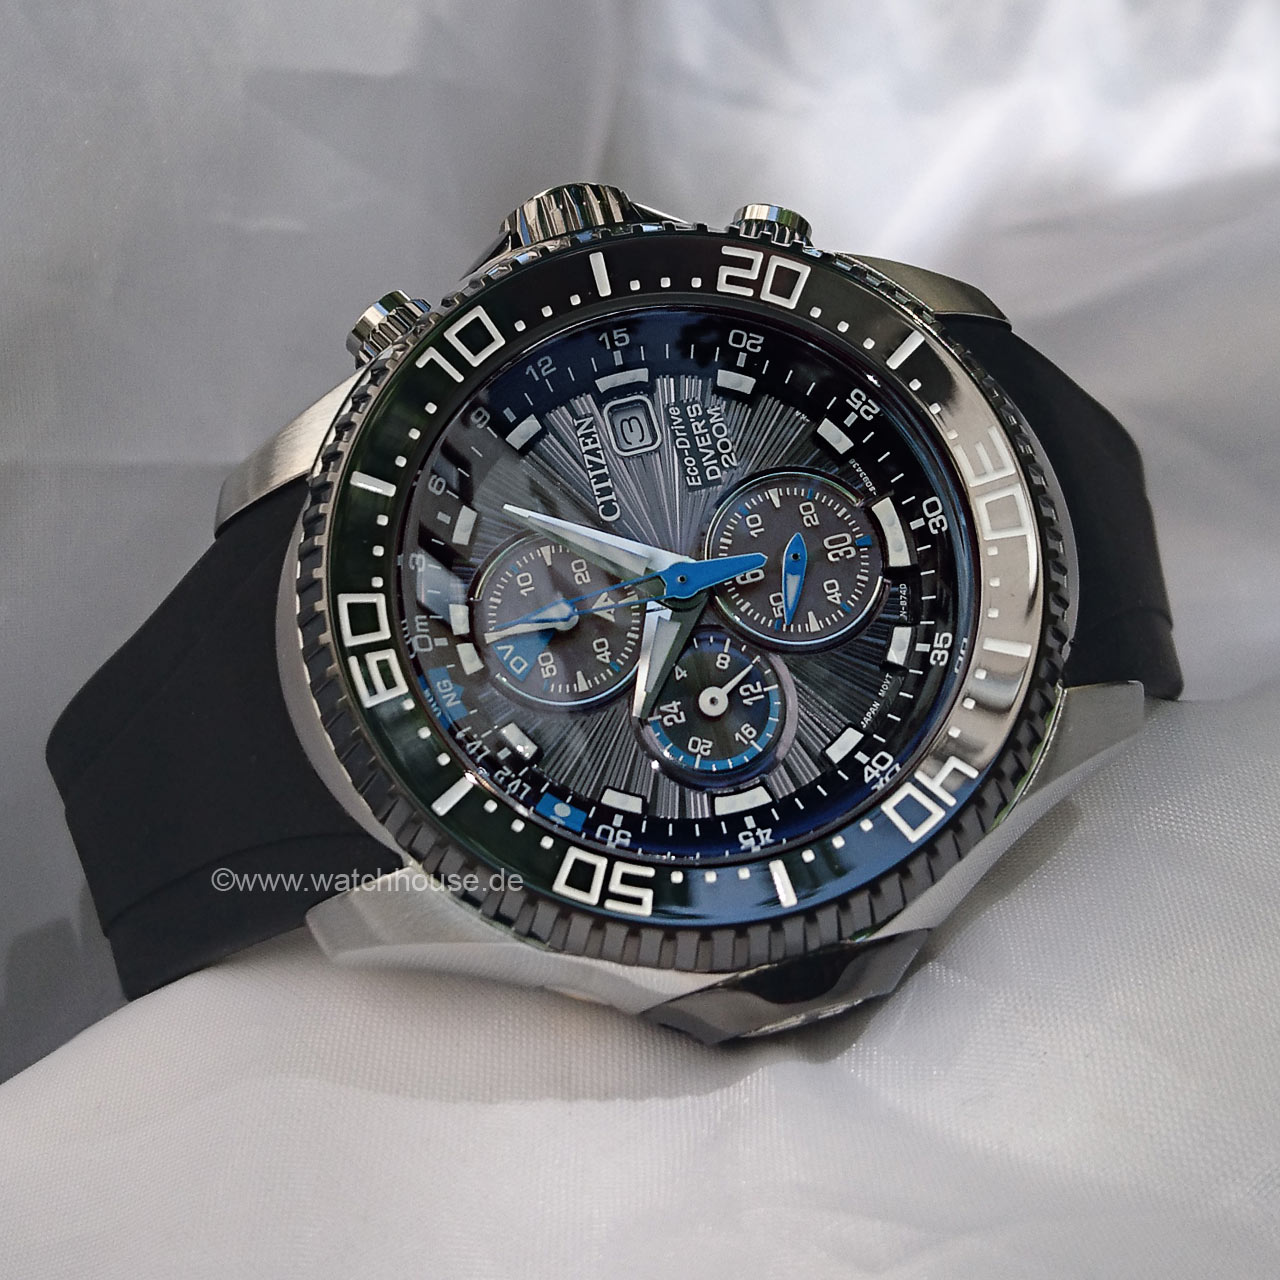 Citizen Promaster Sea Aqualand BJ2111-08E Taucheruhr